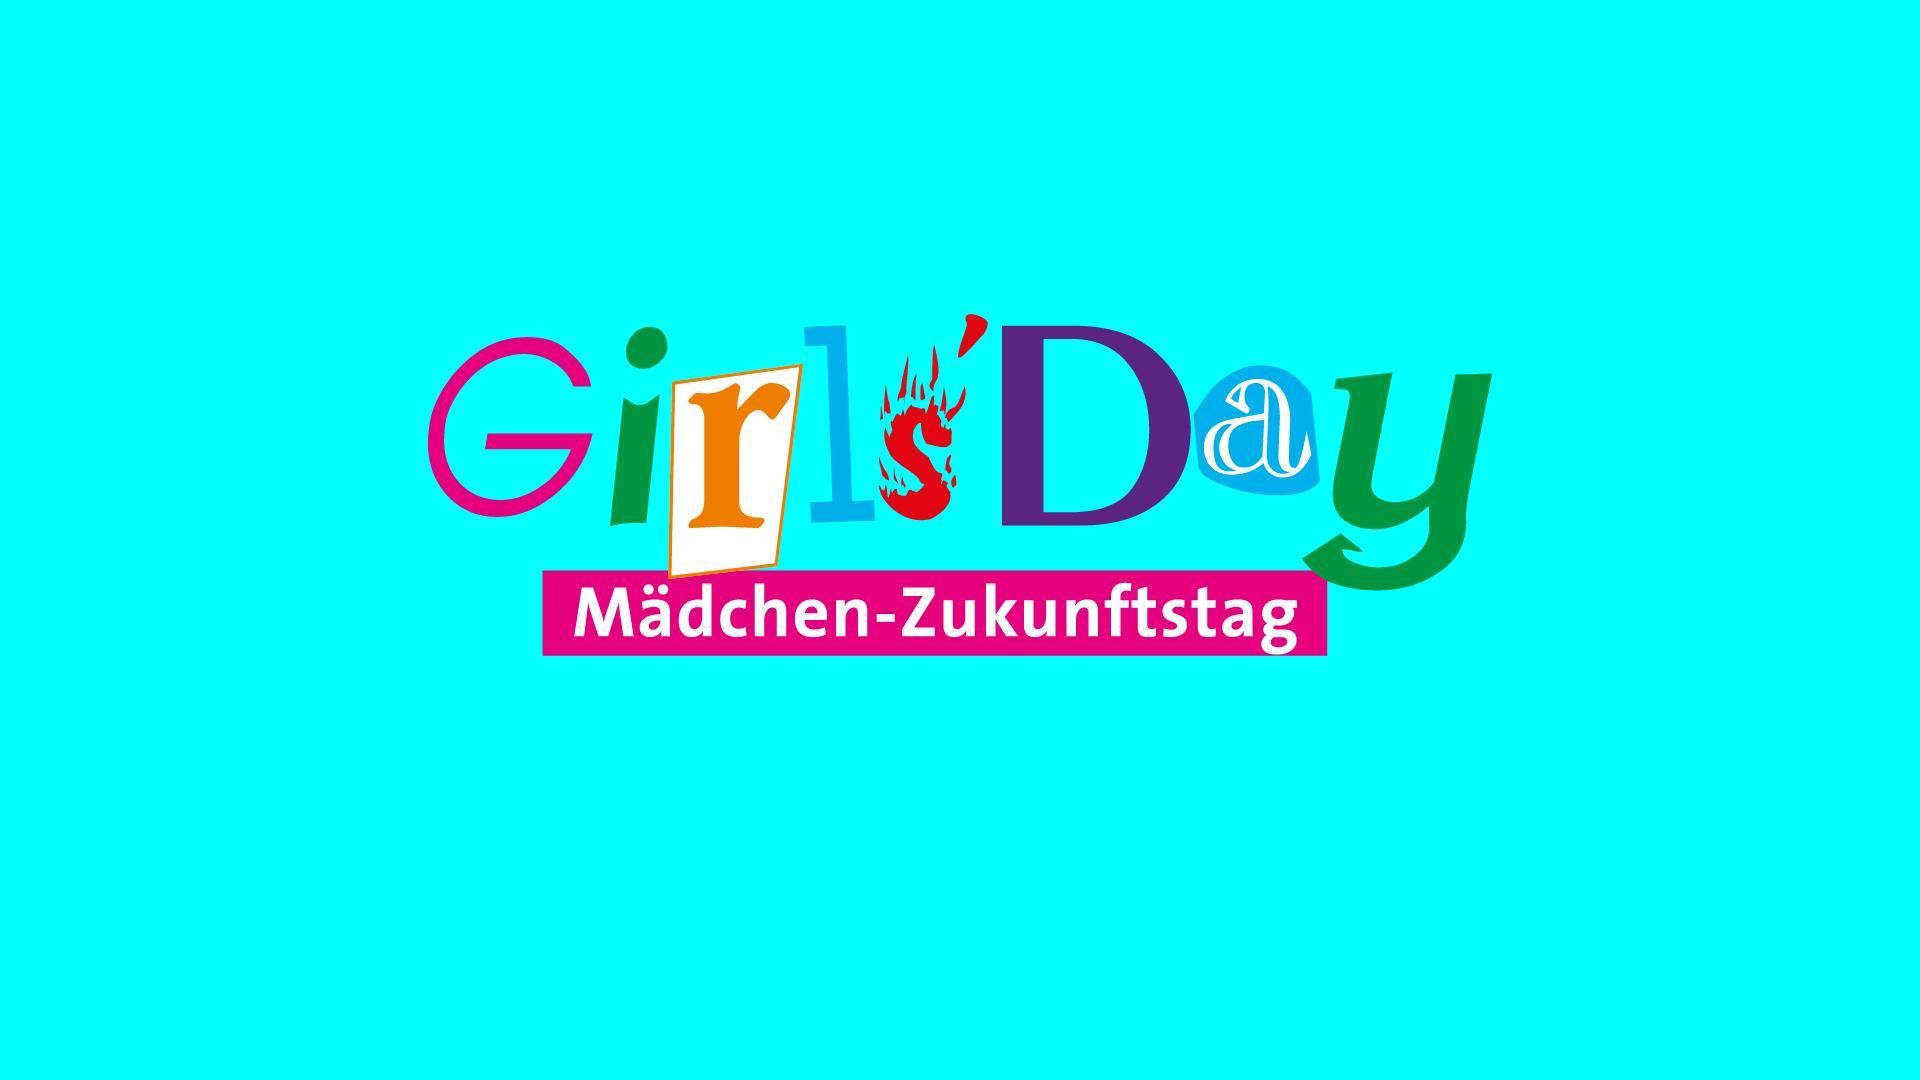 GirlsDay Logo auf cyanfarbenem Grund